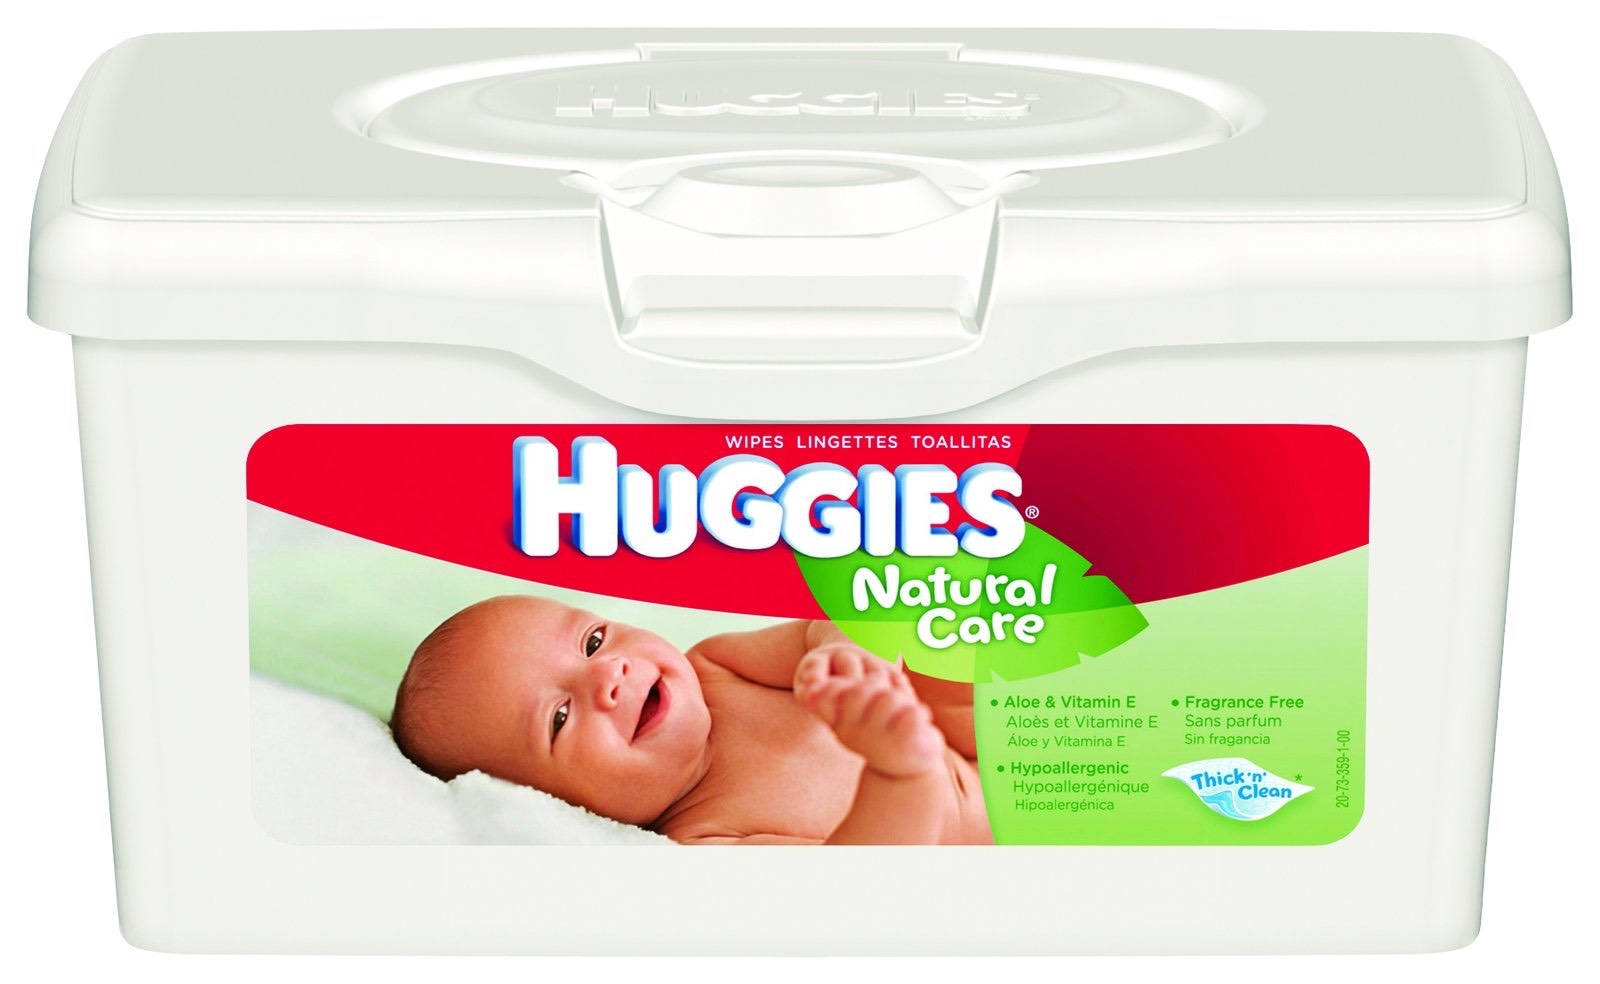 Hot Walgreens Free Huggies Natural Care Wipes